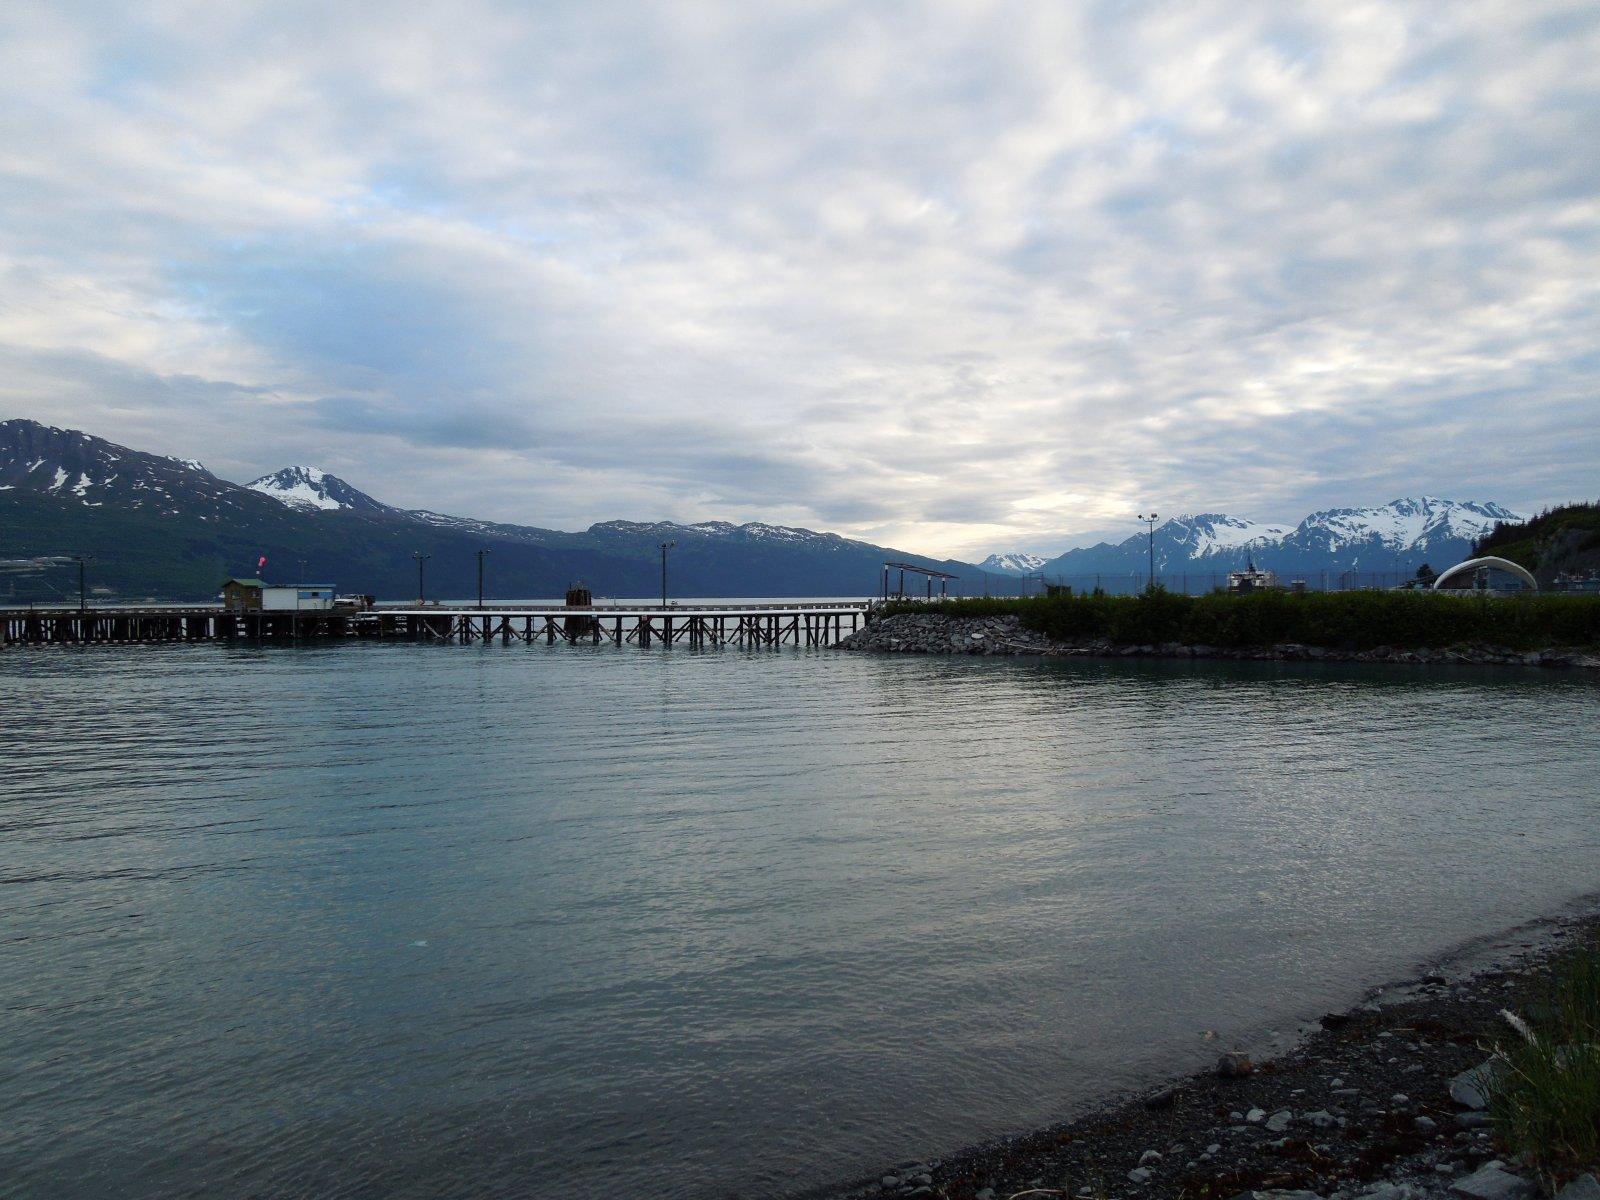 Click image for larger version  Name:Valdez to Copper River Center 096.jpg Views:59 Size:287.8 KB ID:215363